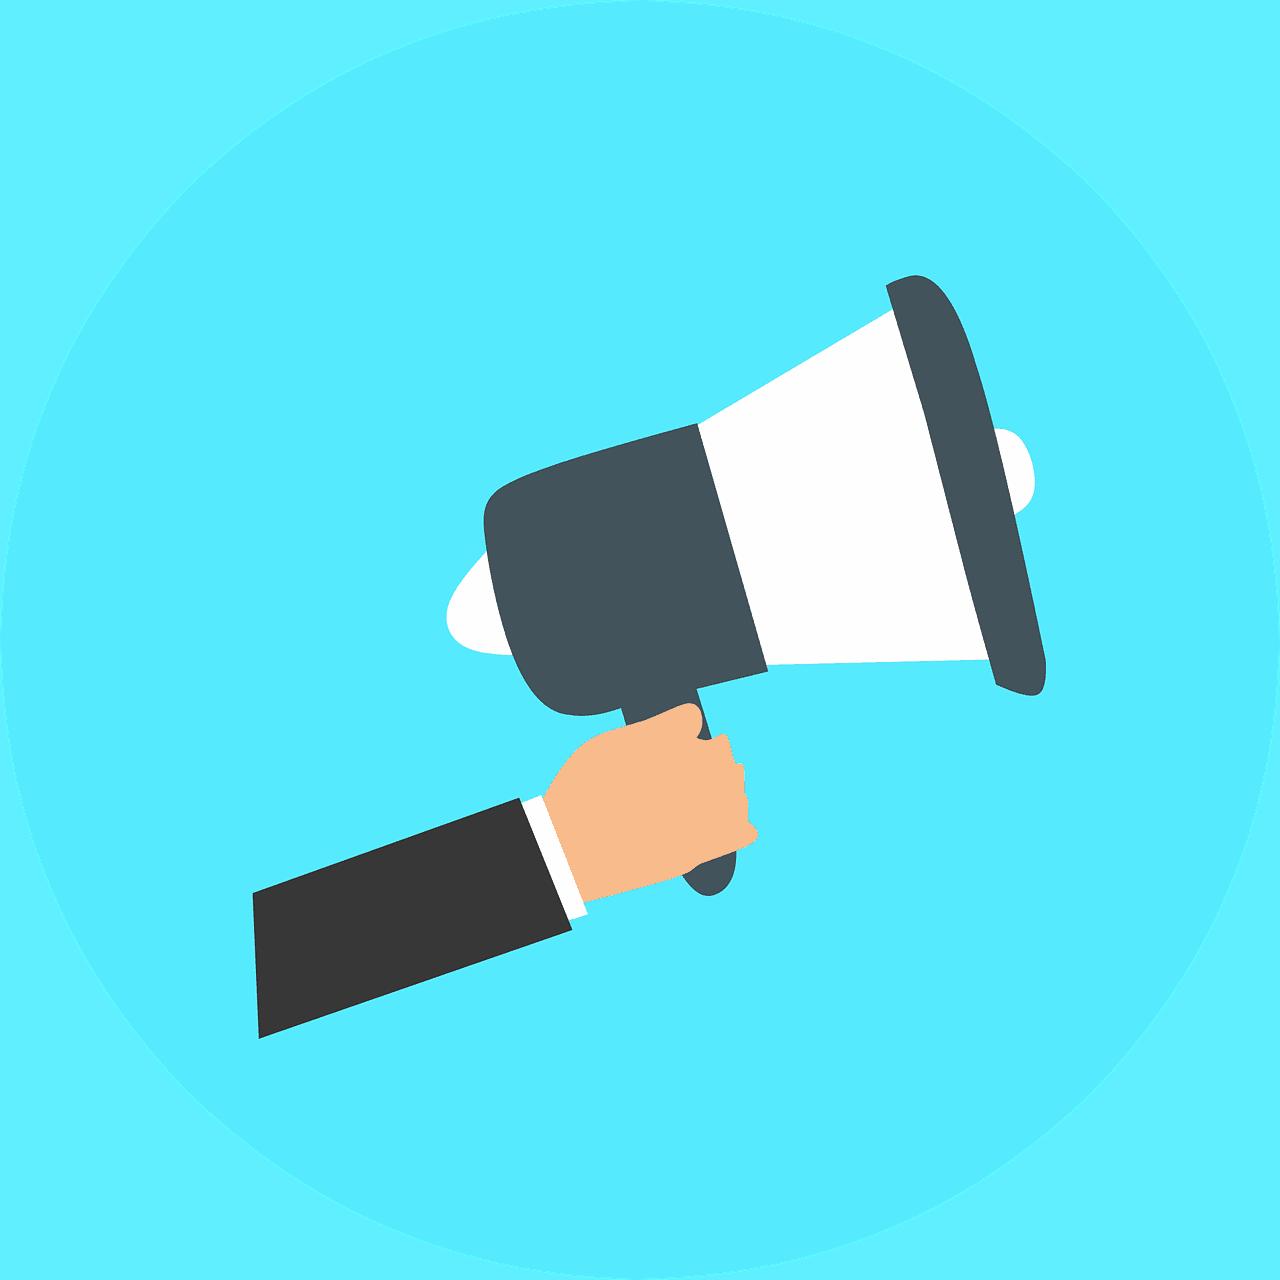 Poziv. Vir: Pixabay